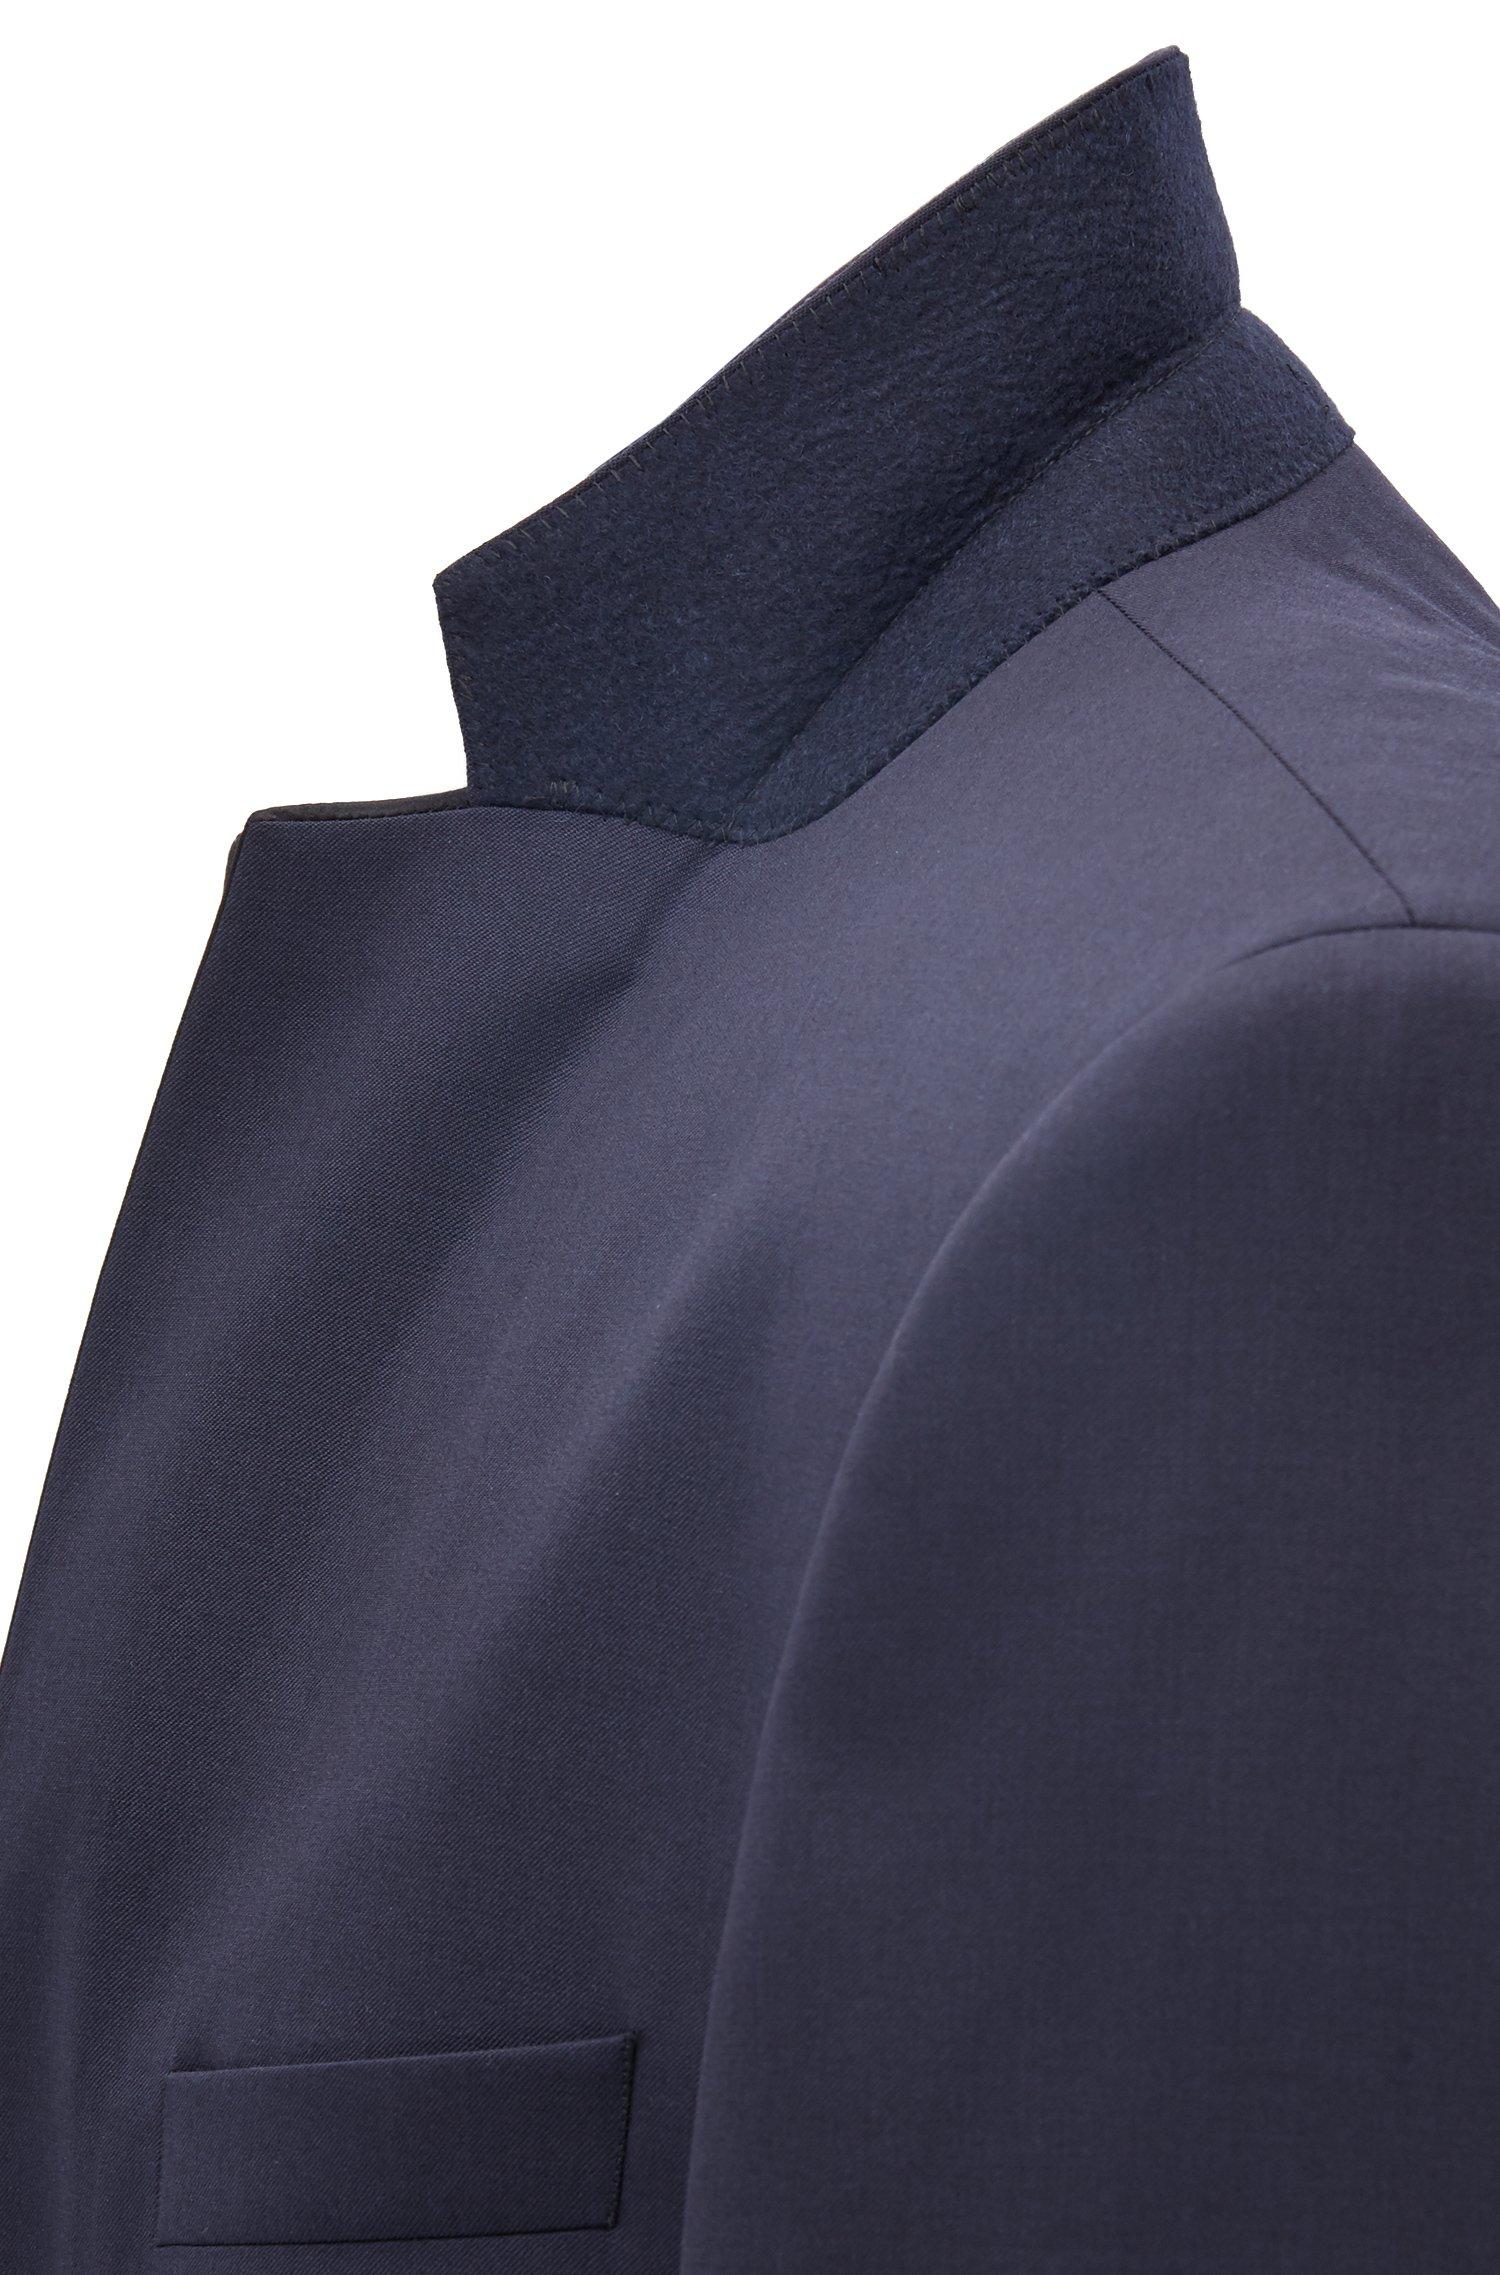 Giacca slim fit in lana vergine con dettagli in seta. Hugo Boss HUGO BOSS  37d36c1d689e